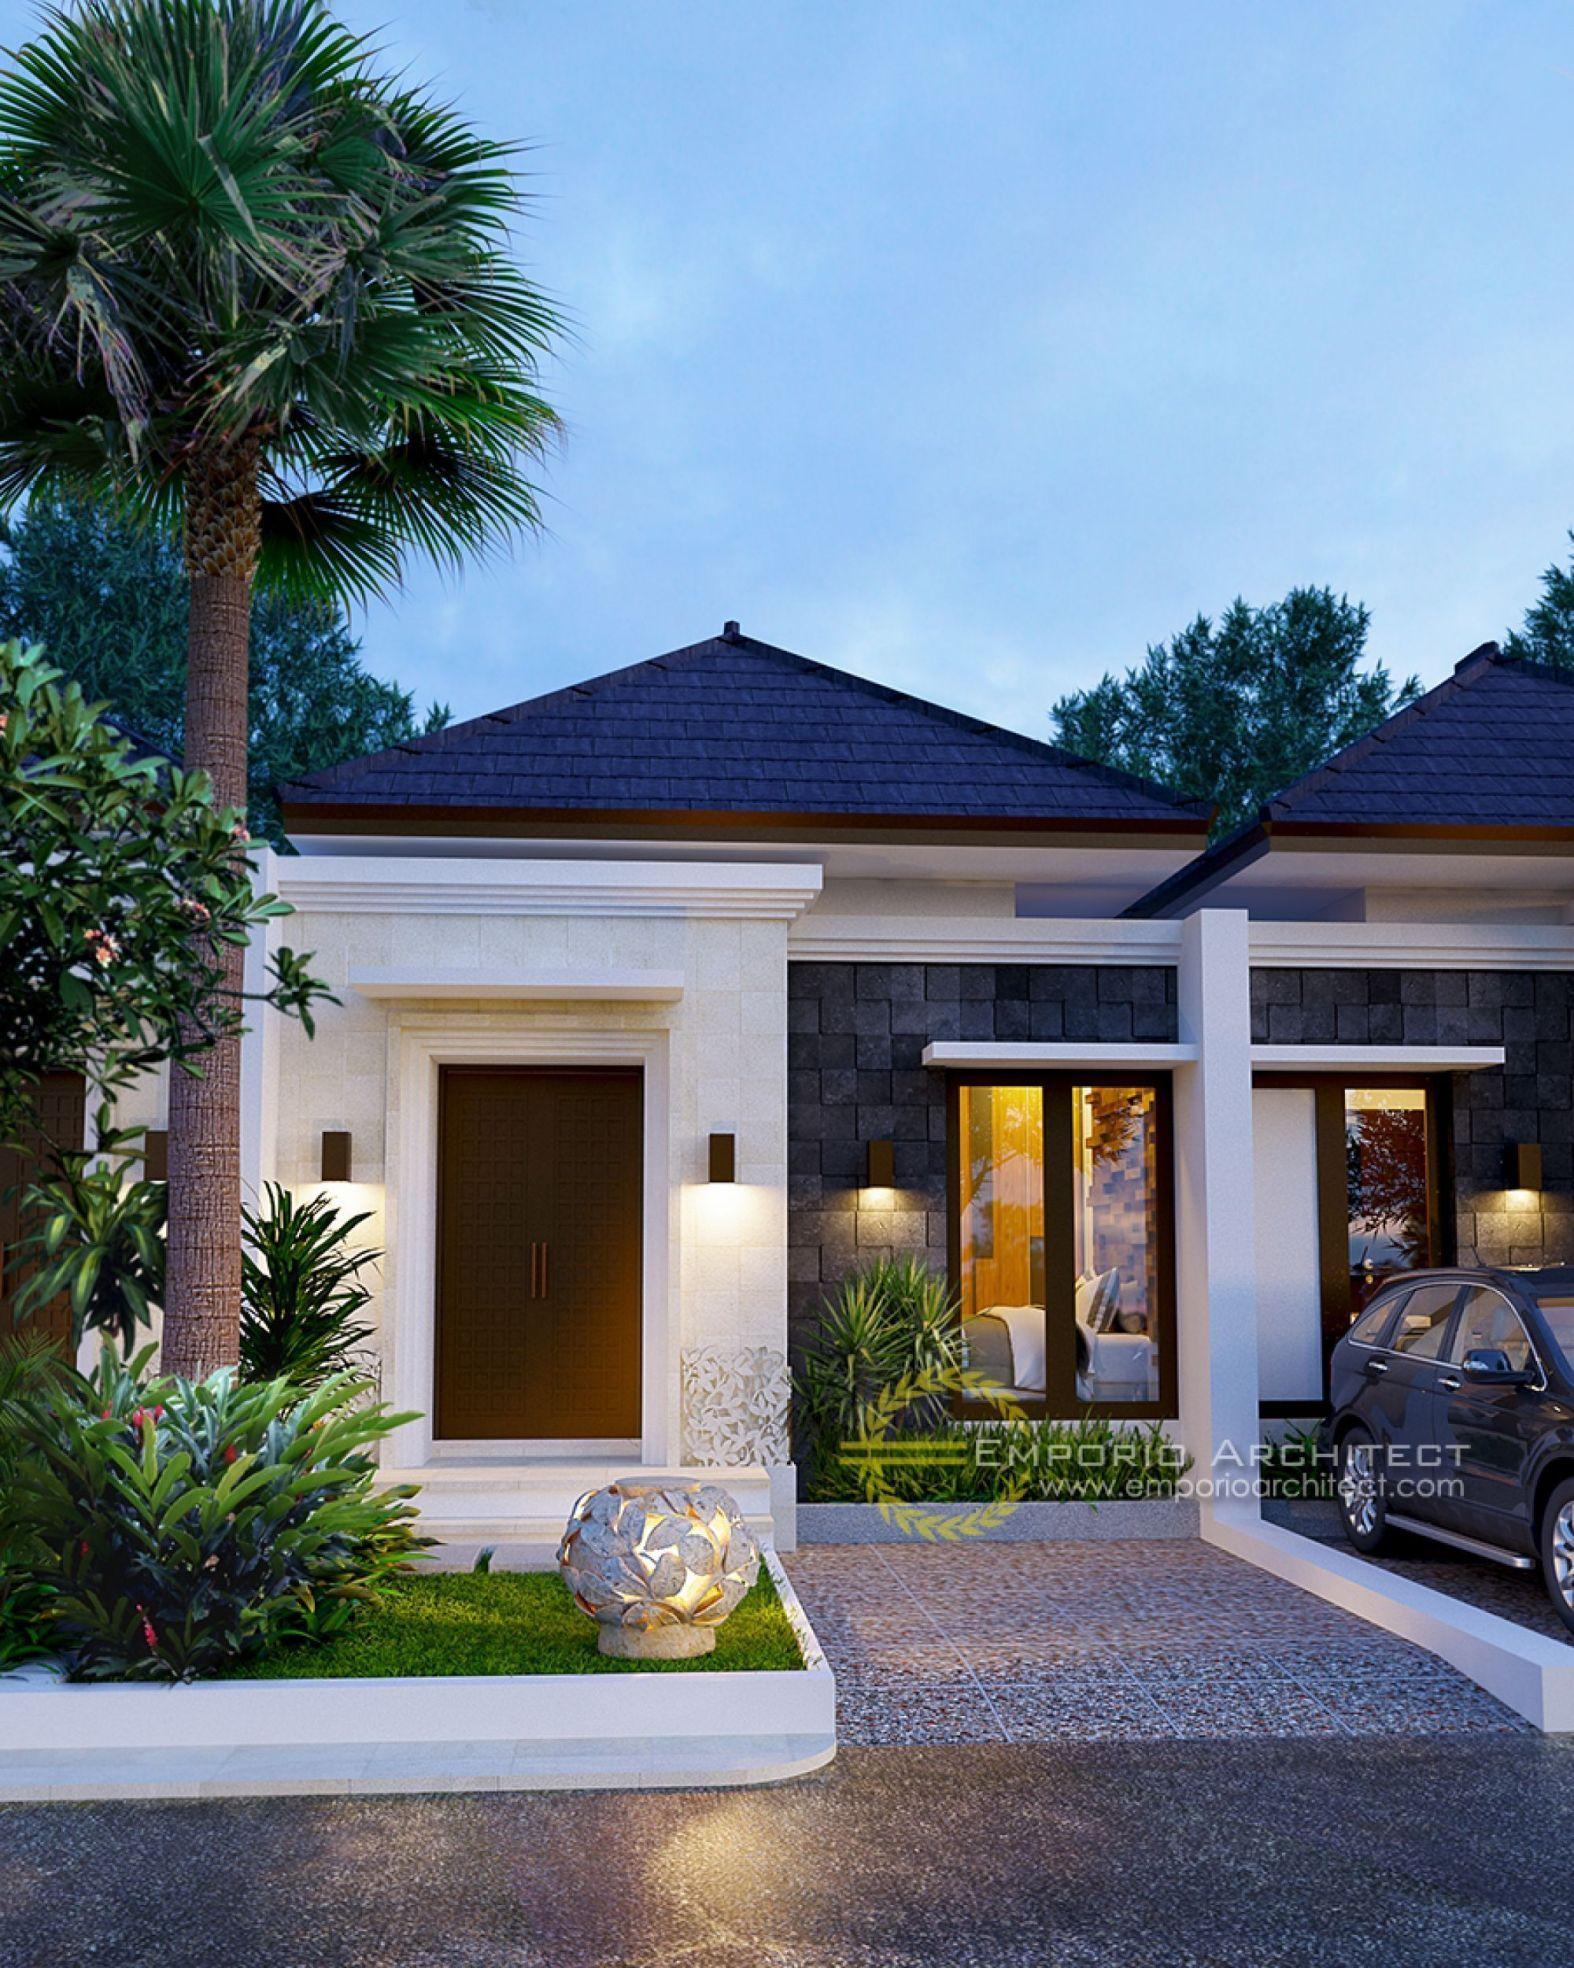 13 Gorgeously Minimalist Home Design Ideas | Bungalow ...